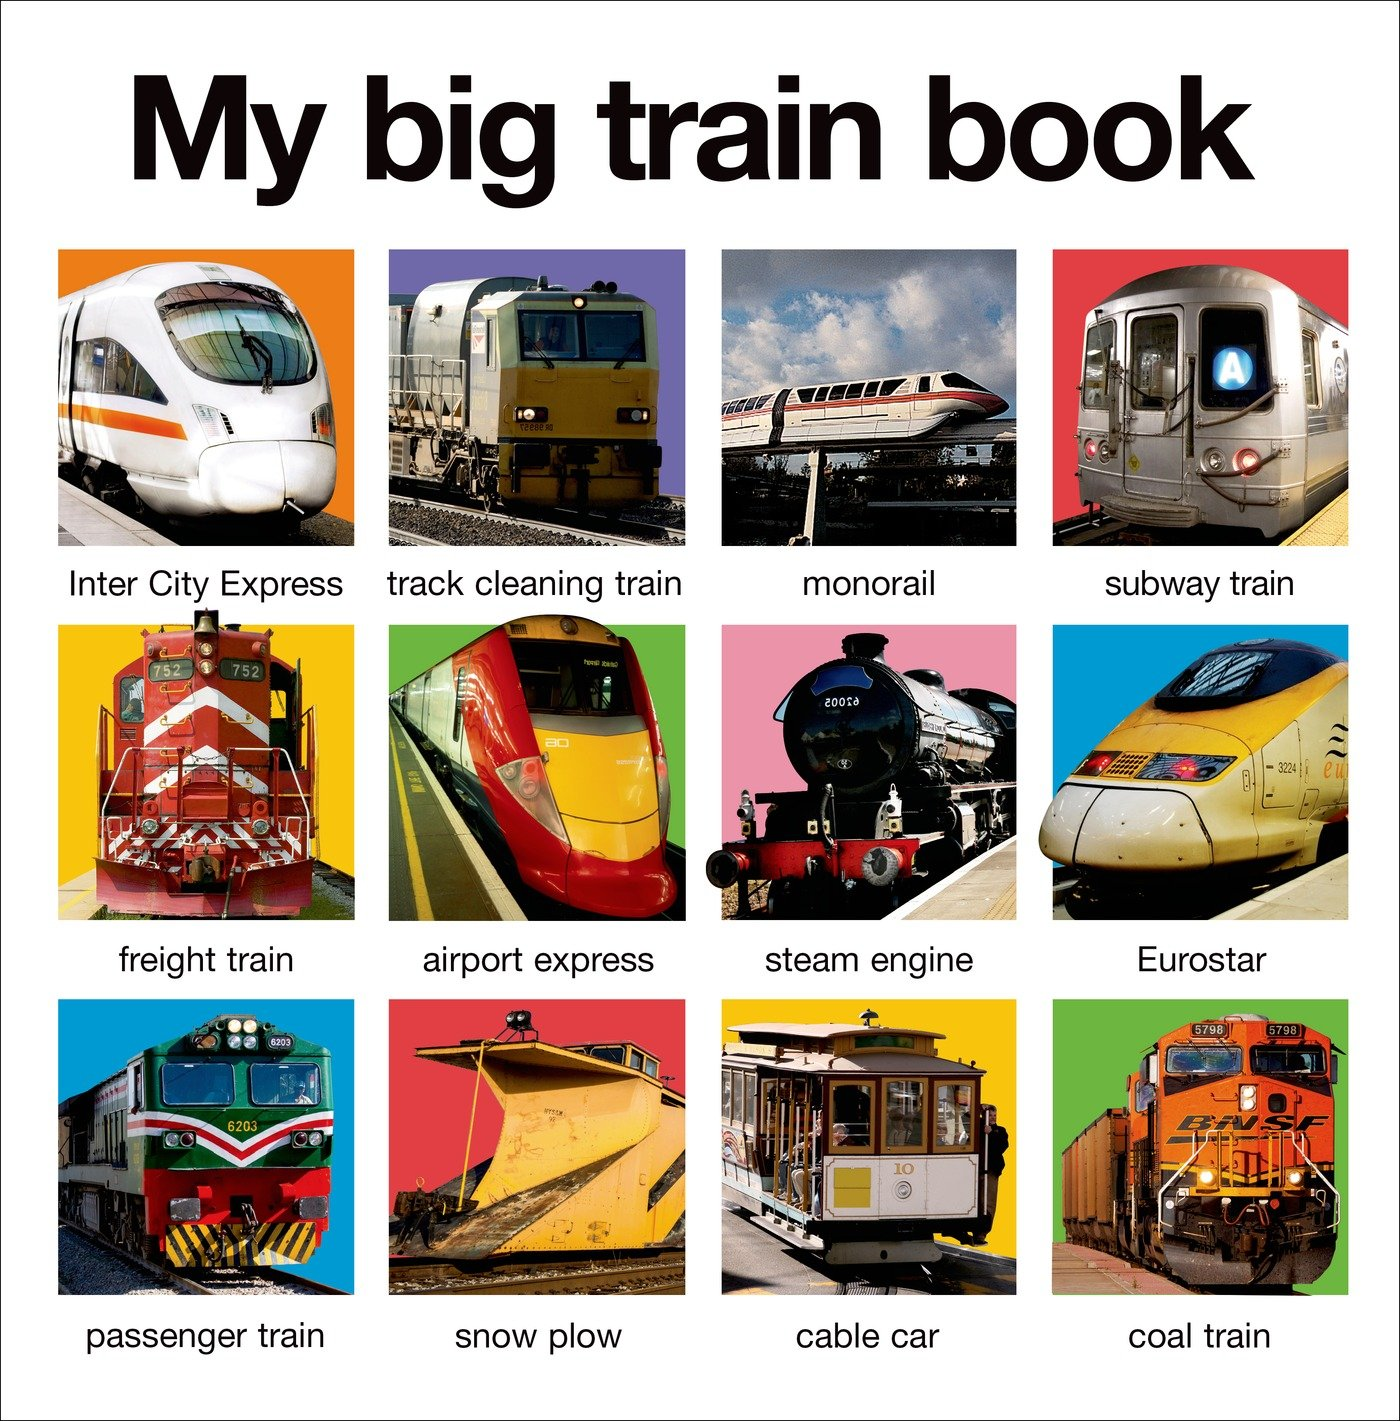 trains9